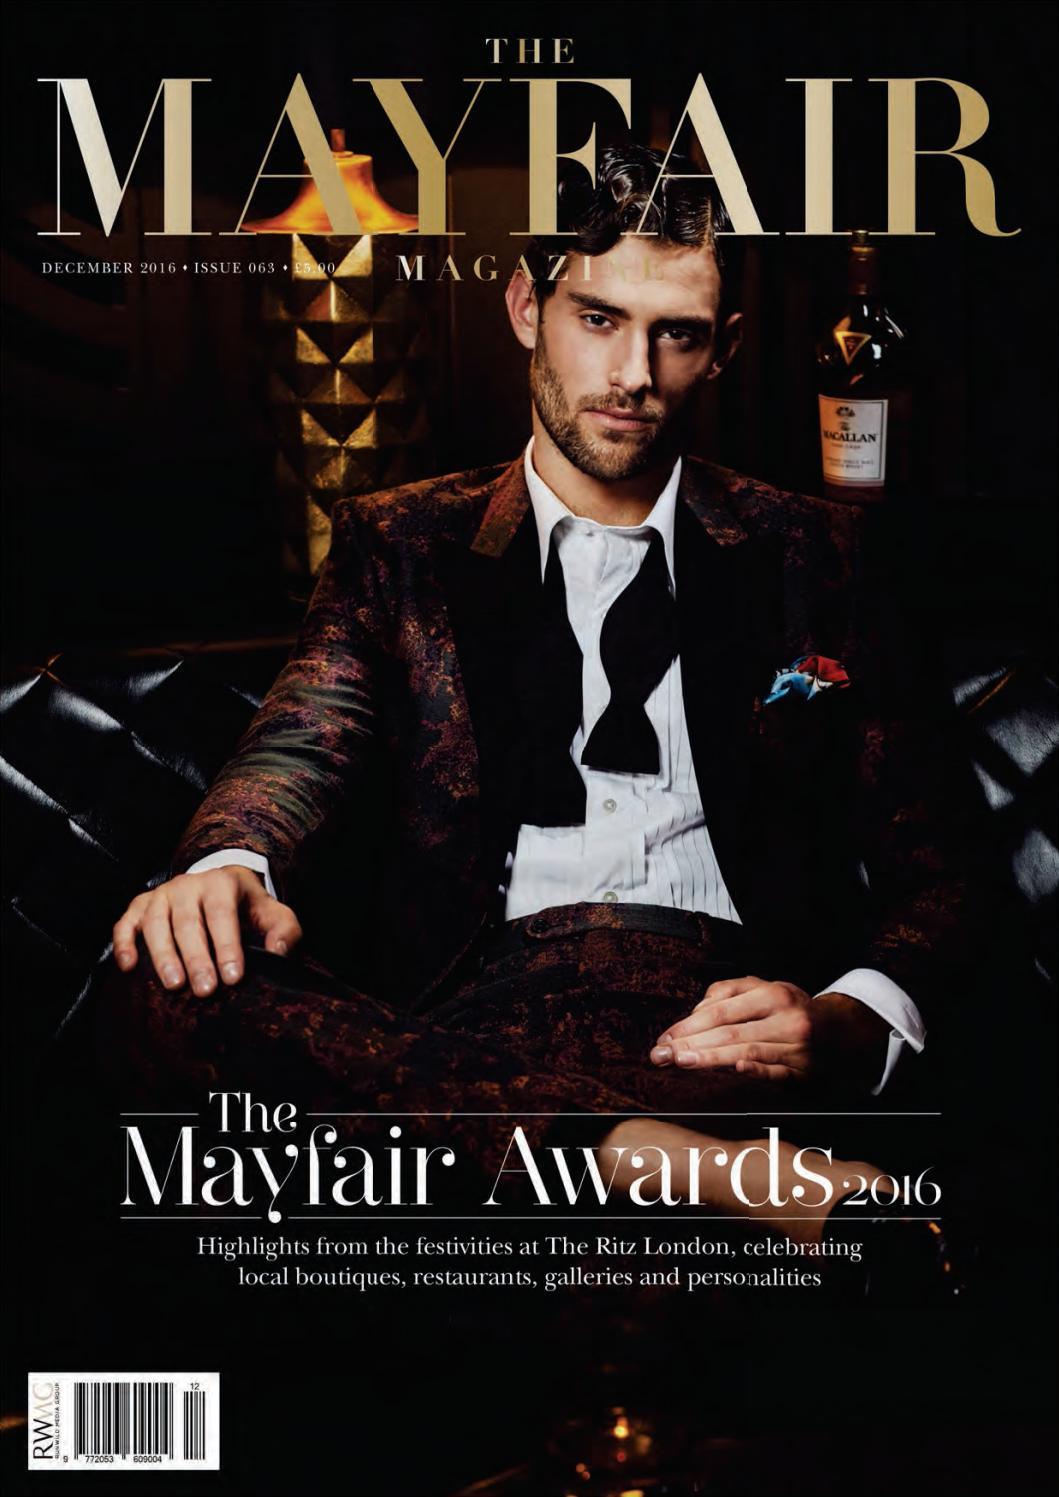 61371492a2 The Mayfair Magazine December 2016 by Runwild Media Group - issuu